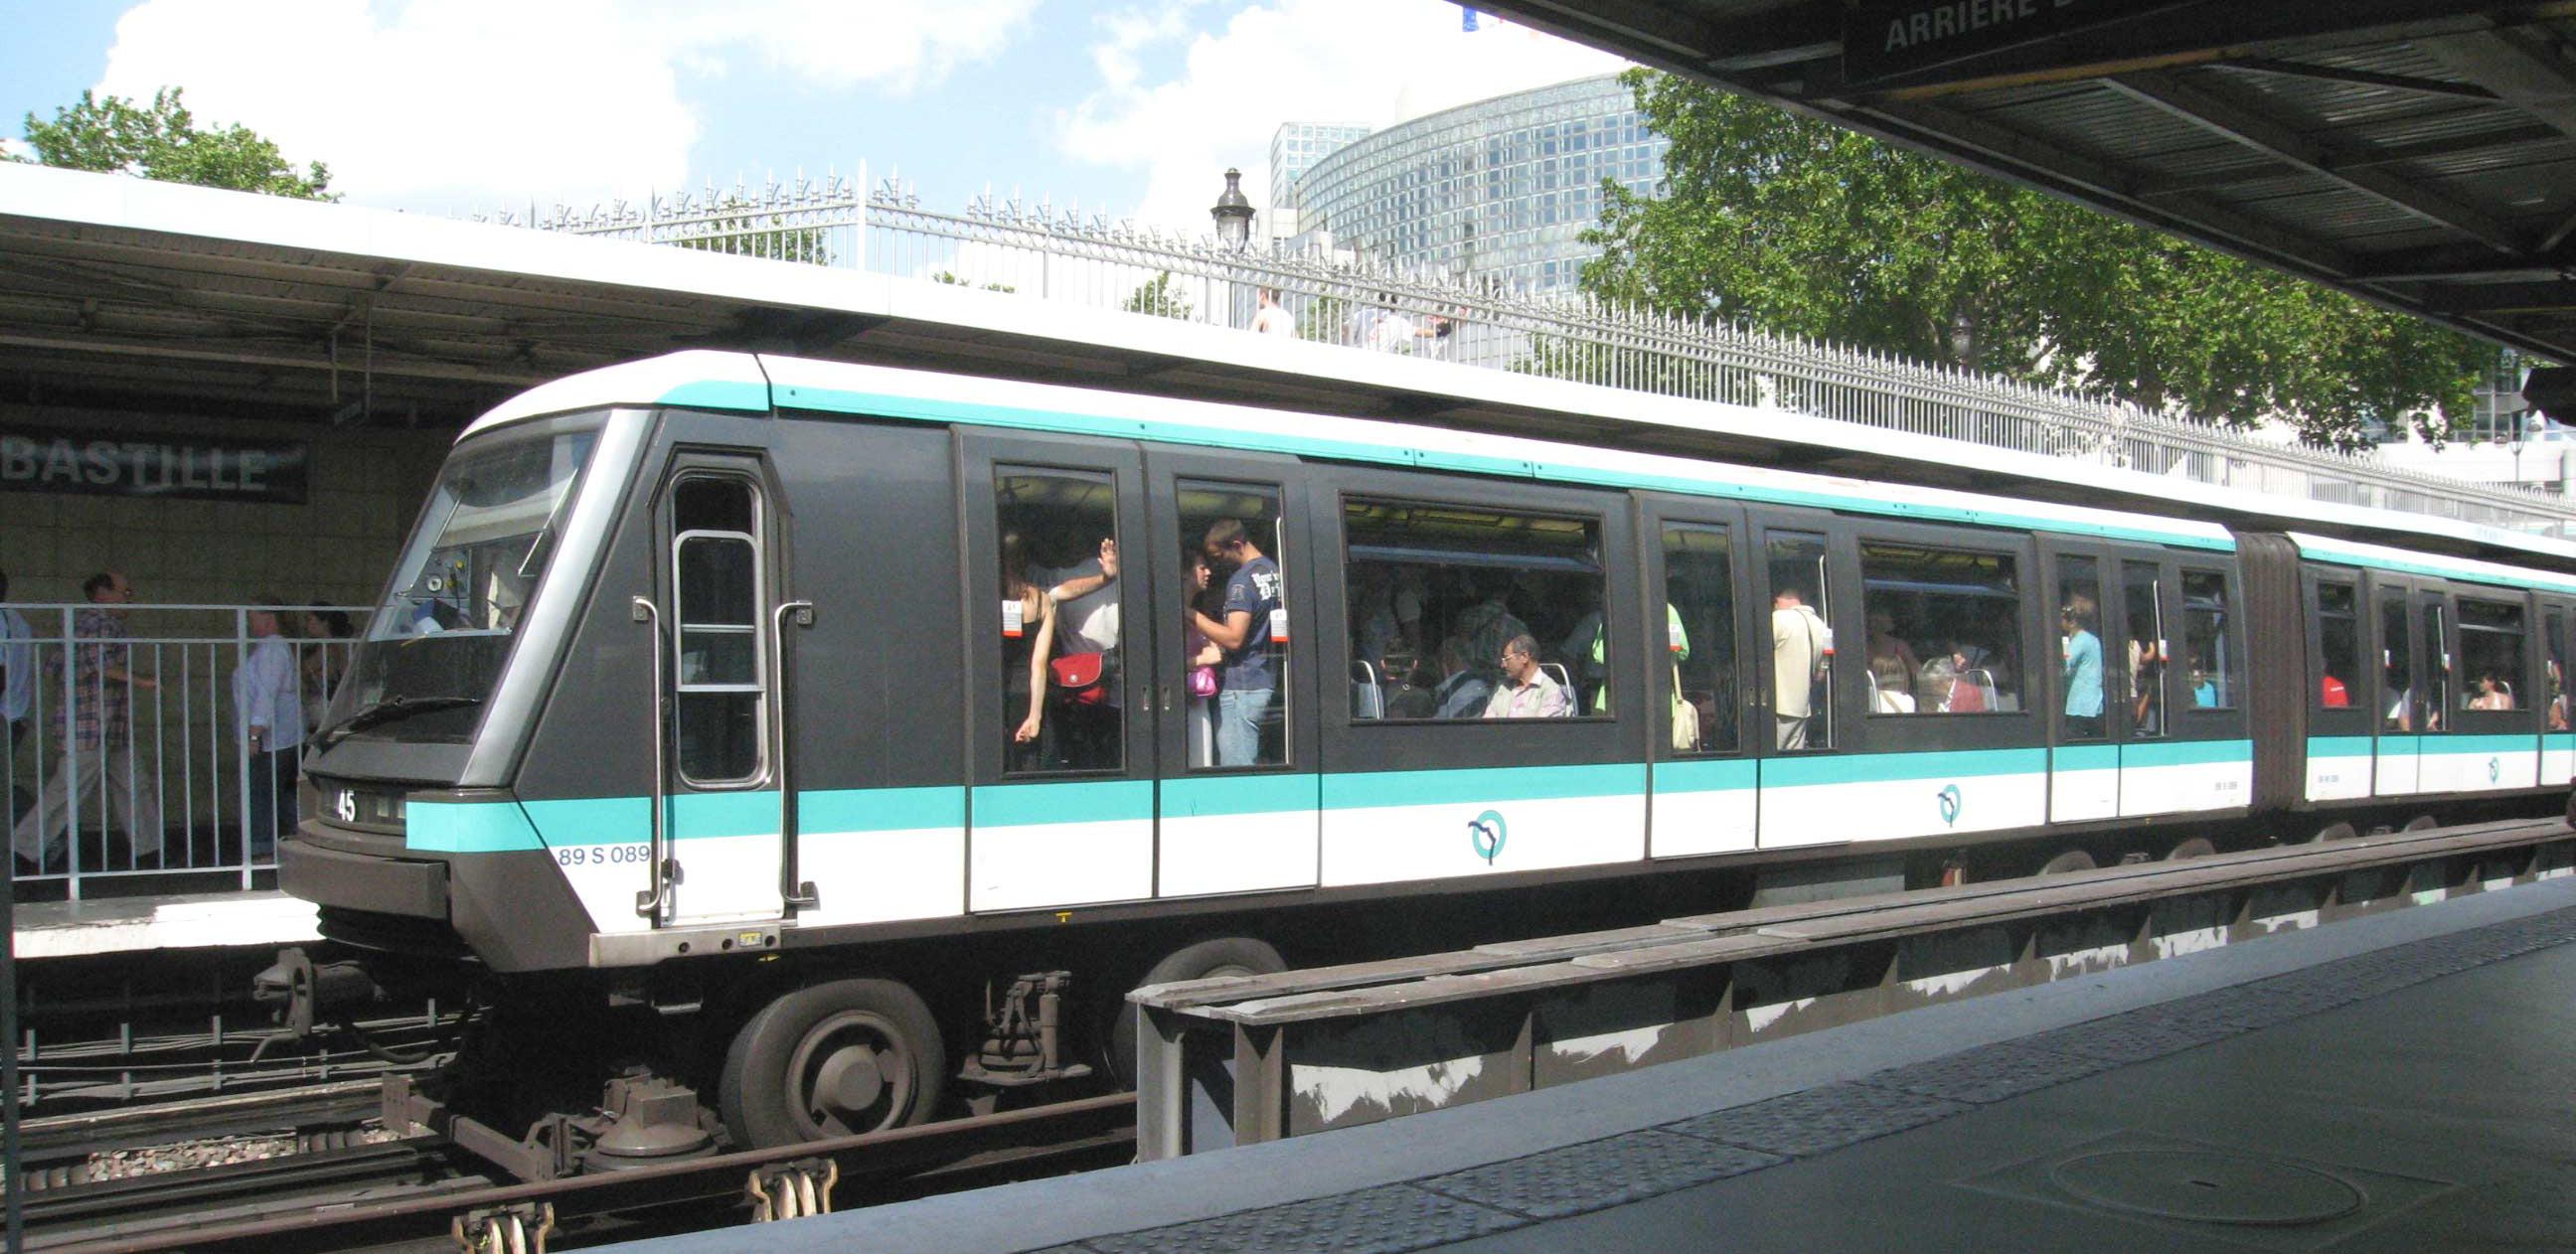 Paris Metro MP89 with Rubber Tires